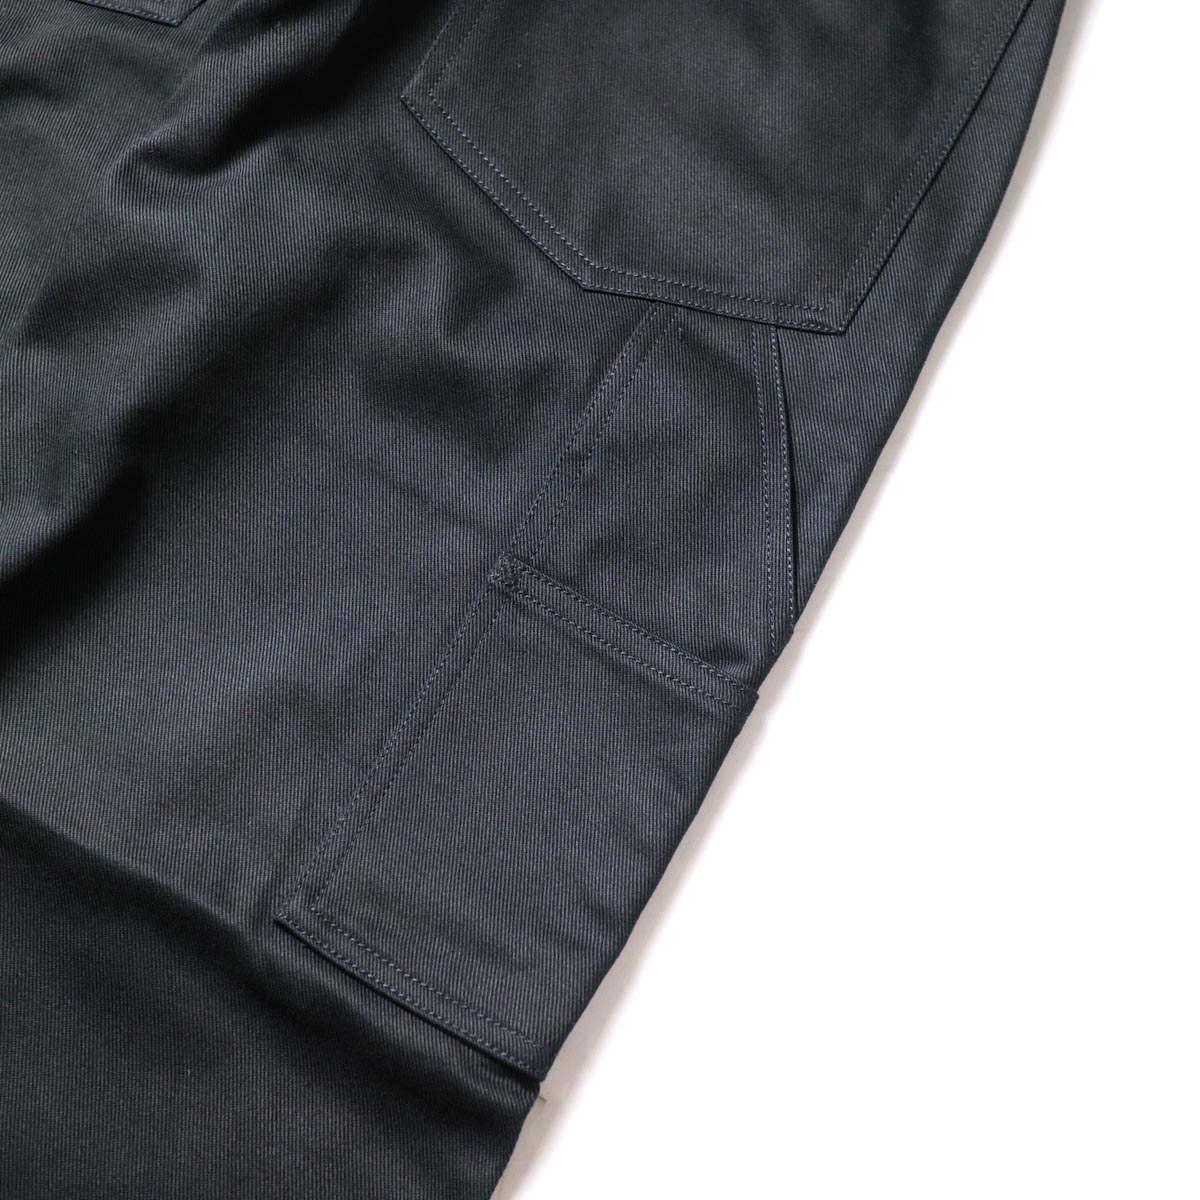 FUTURE PRIMITIVE / FP FZ PAINTER PANTS (Black)ツールポケット